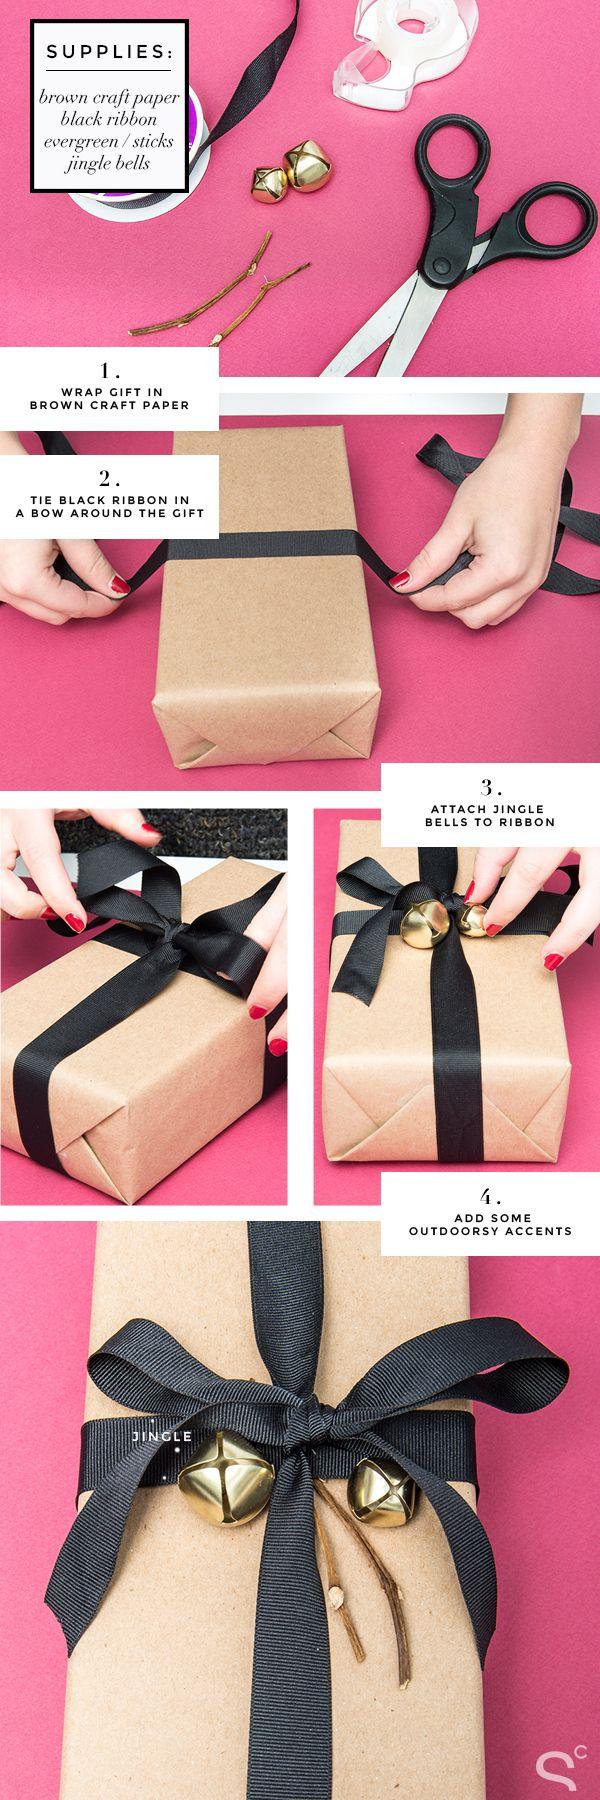 image c/o  stylecaster.com ; written by:  Samantha Lim